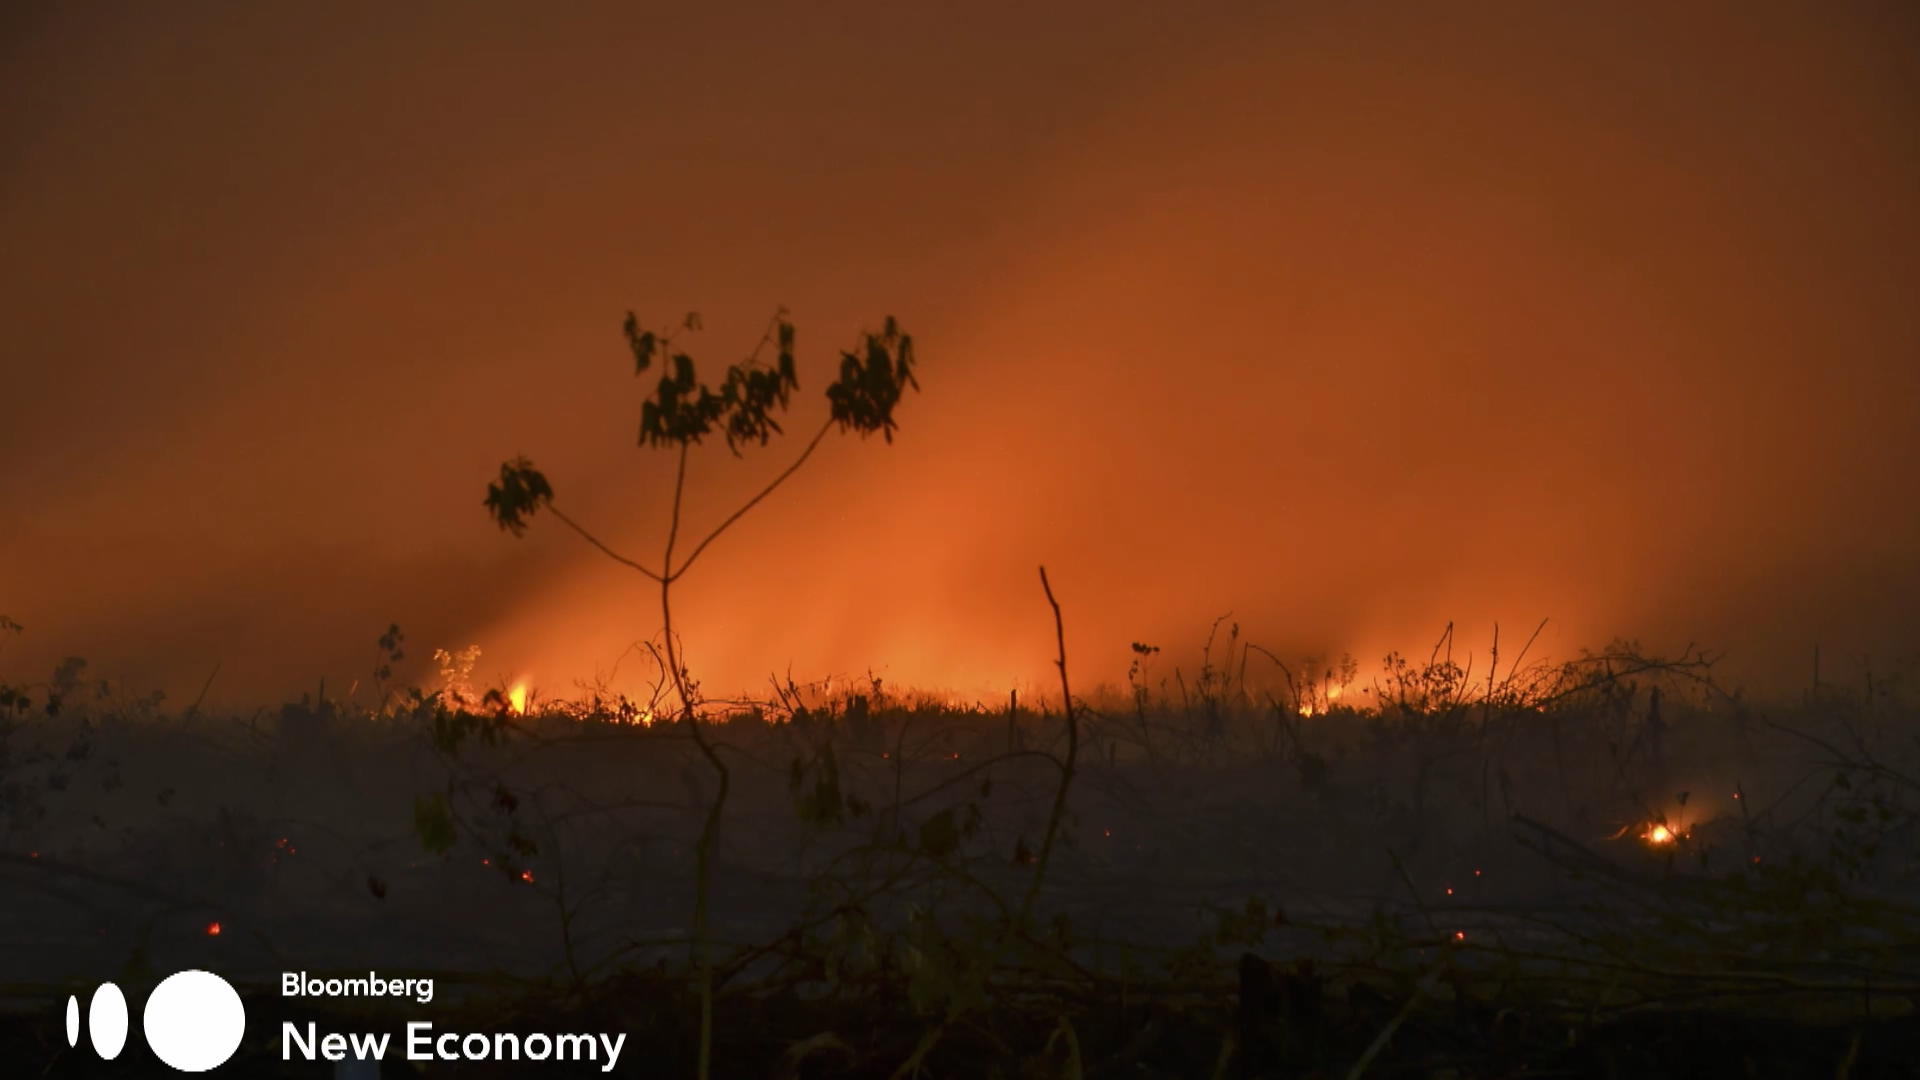 Indonesian Wildfires Spread Noxious Haze Across Southeast Asia